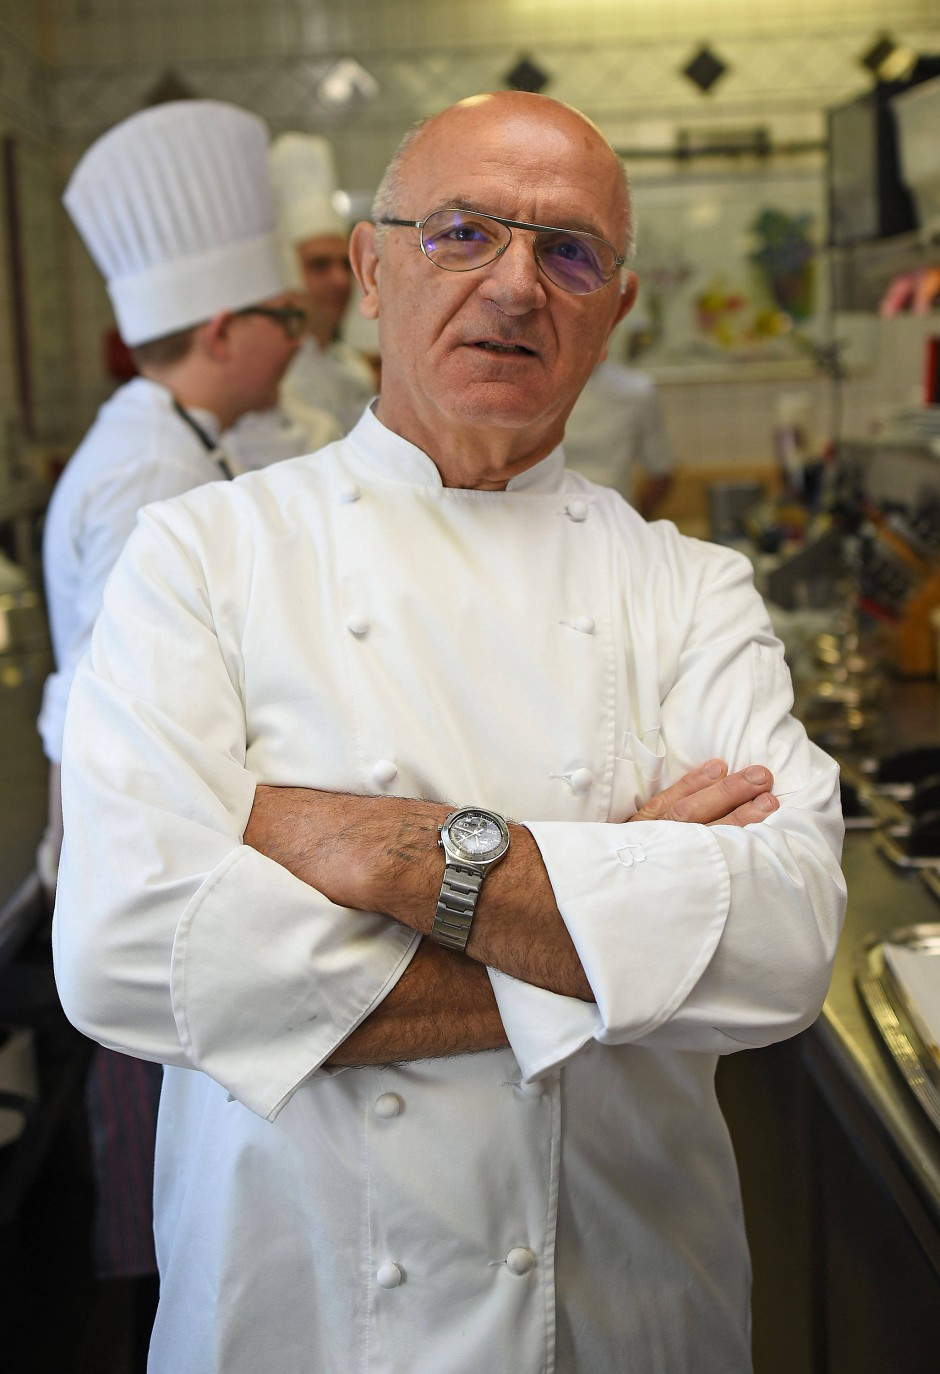 Jean-Claude Bourgueil in Düsseldorf